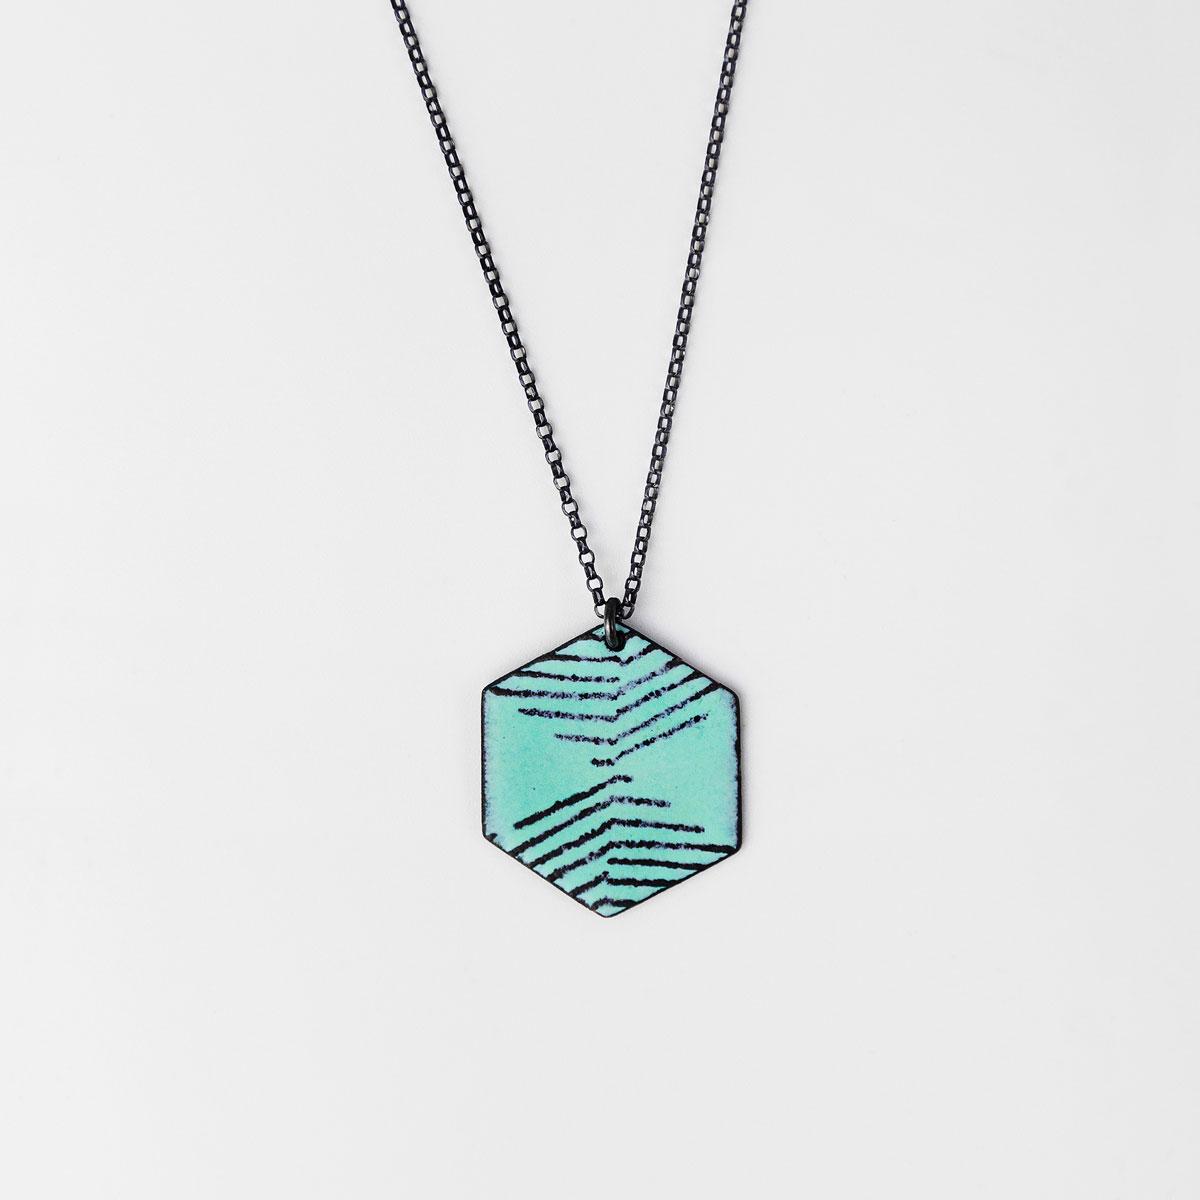 'Weave' Turquoise Hexagonal Pendant